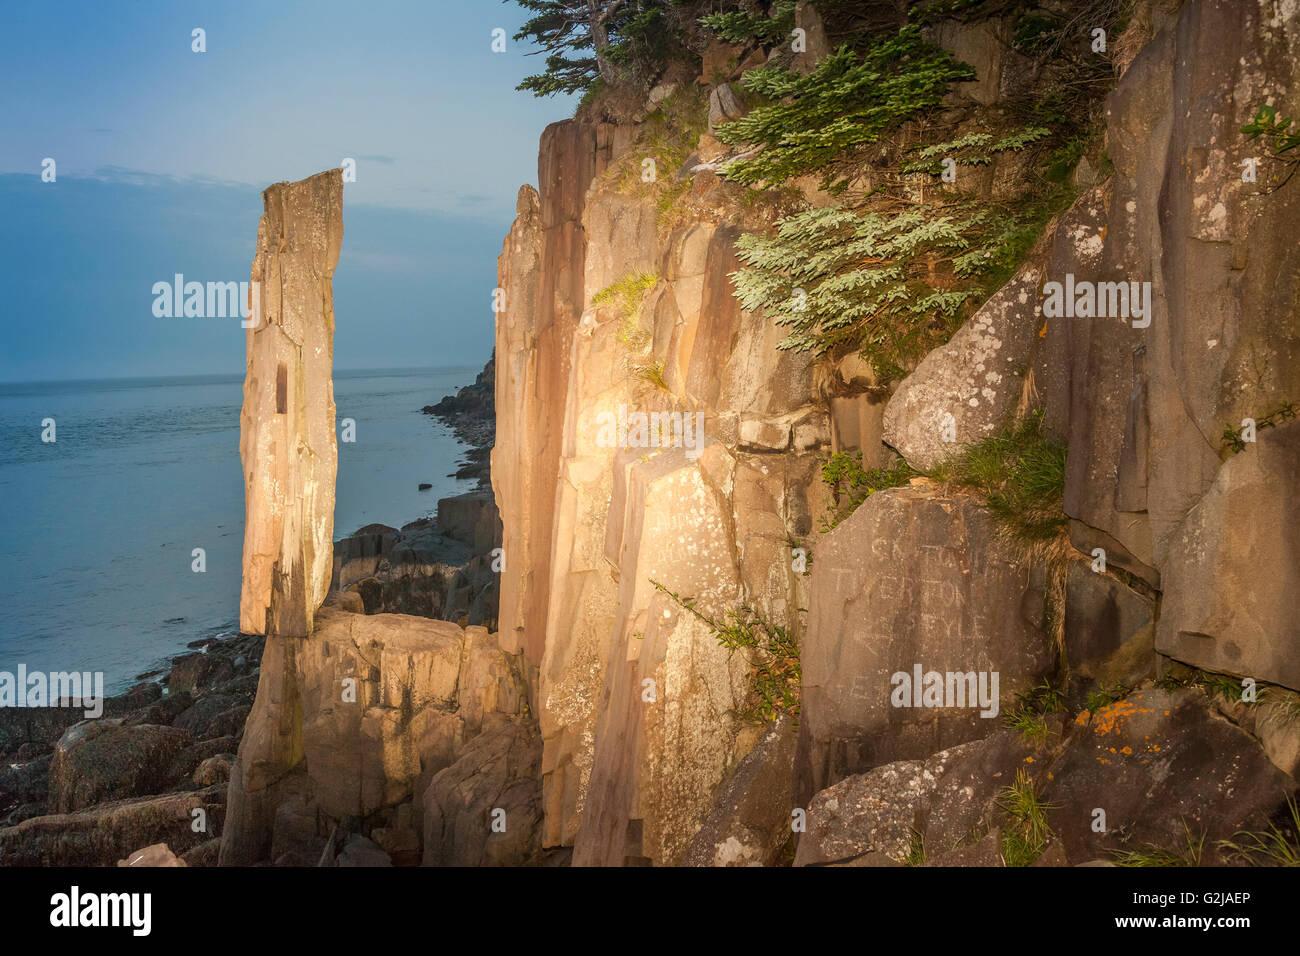 Balancing Rock - a columnar basalt stack on Long Island at Tiverton, Nova Scotia, Canada - Stock Image